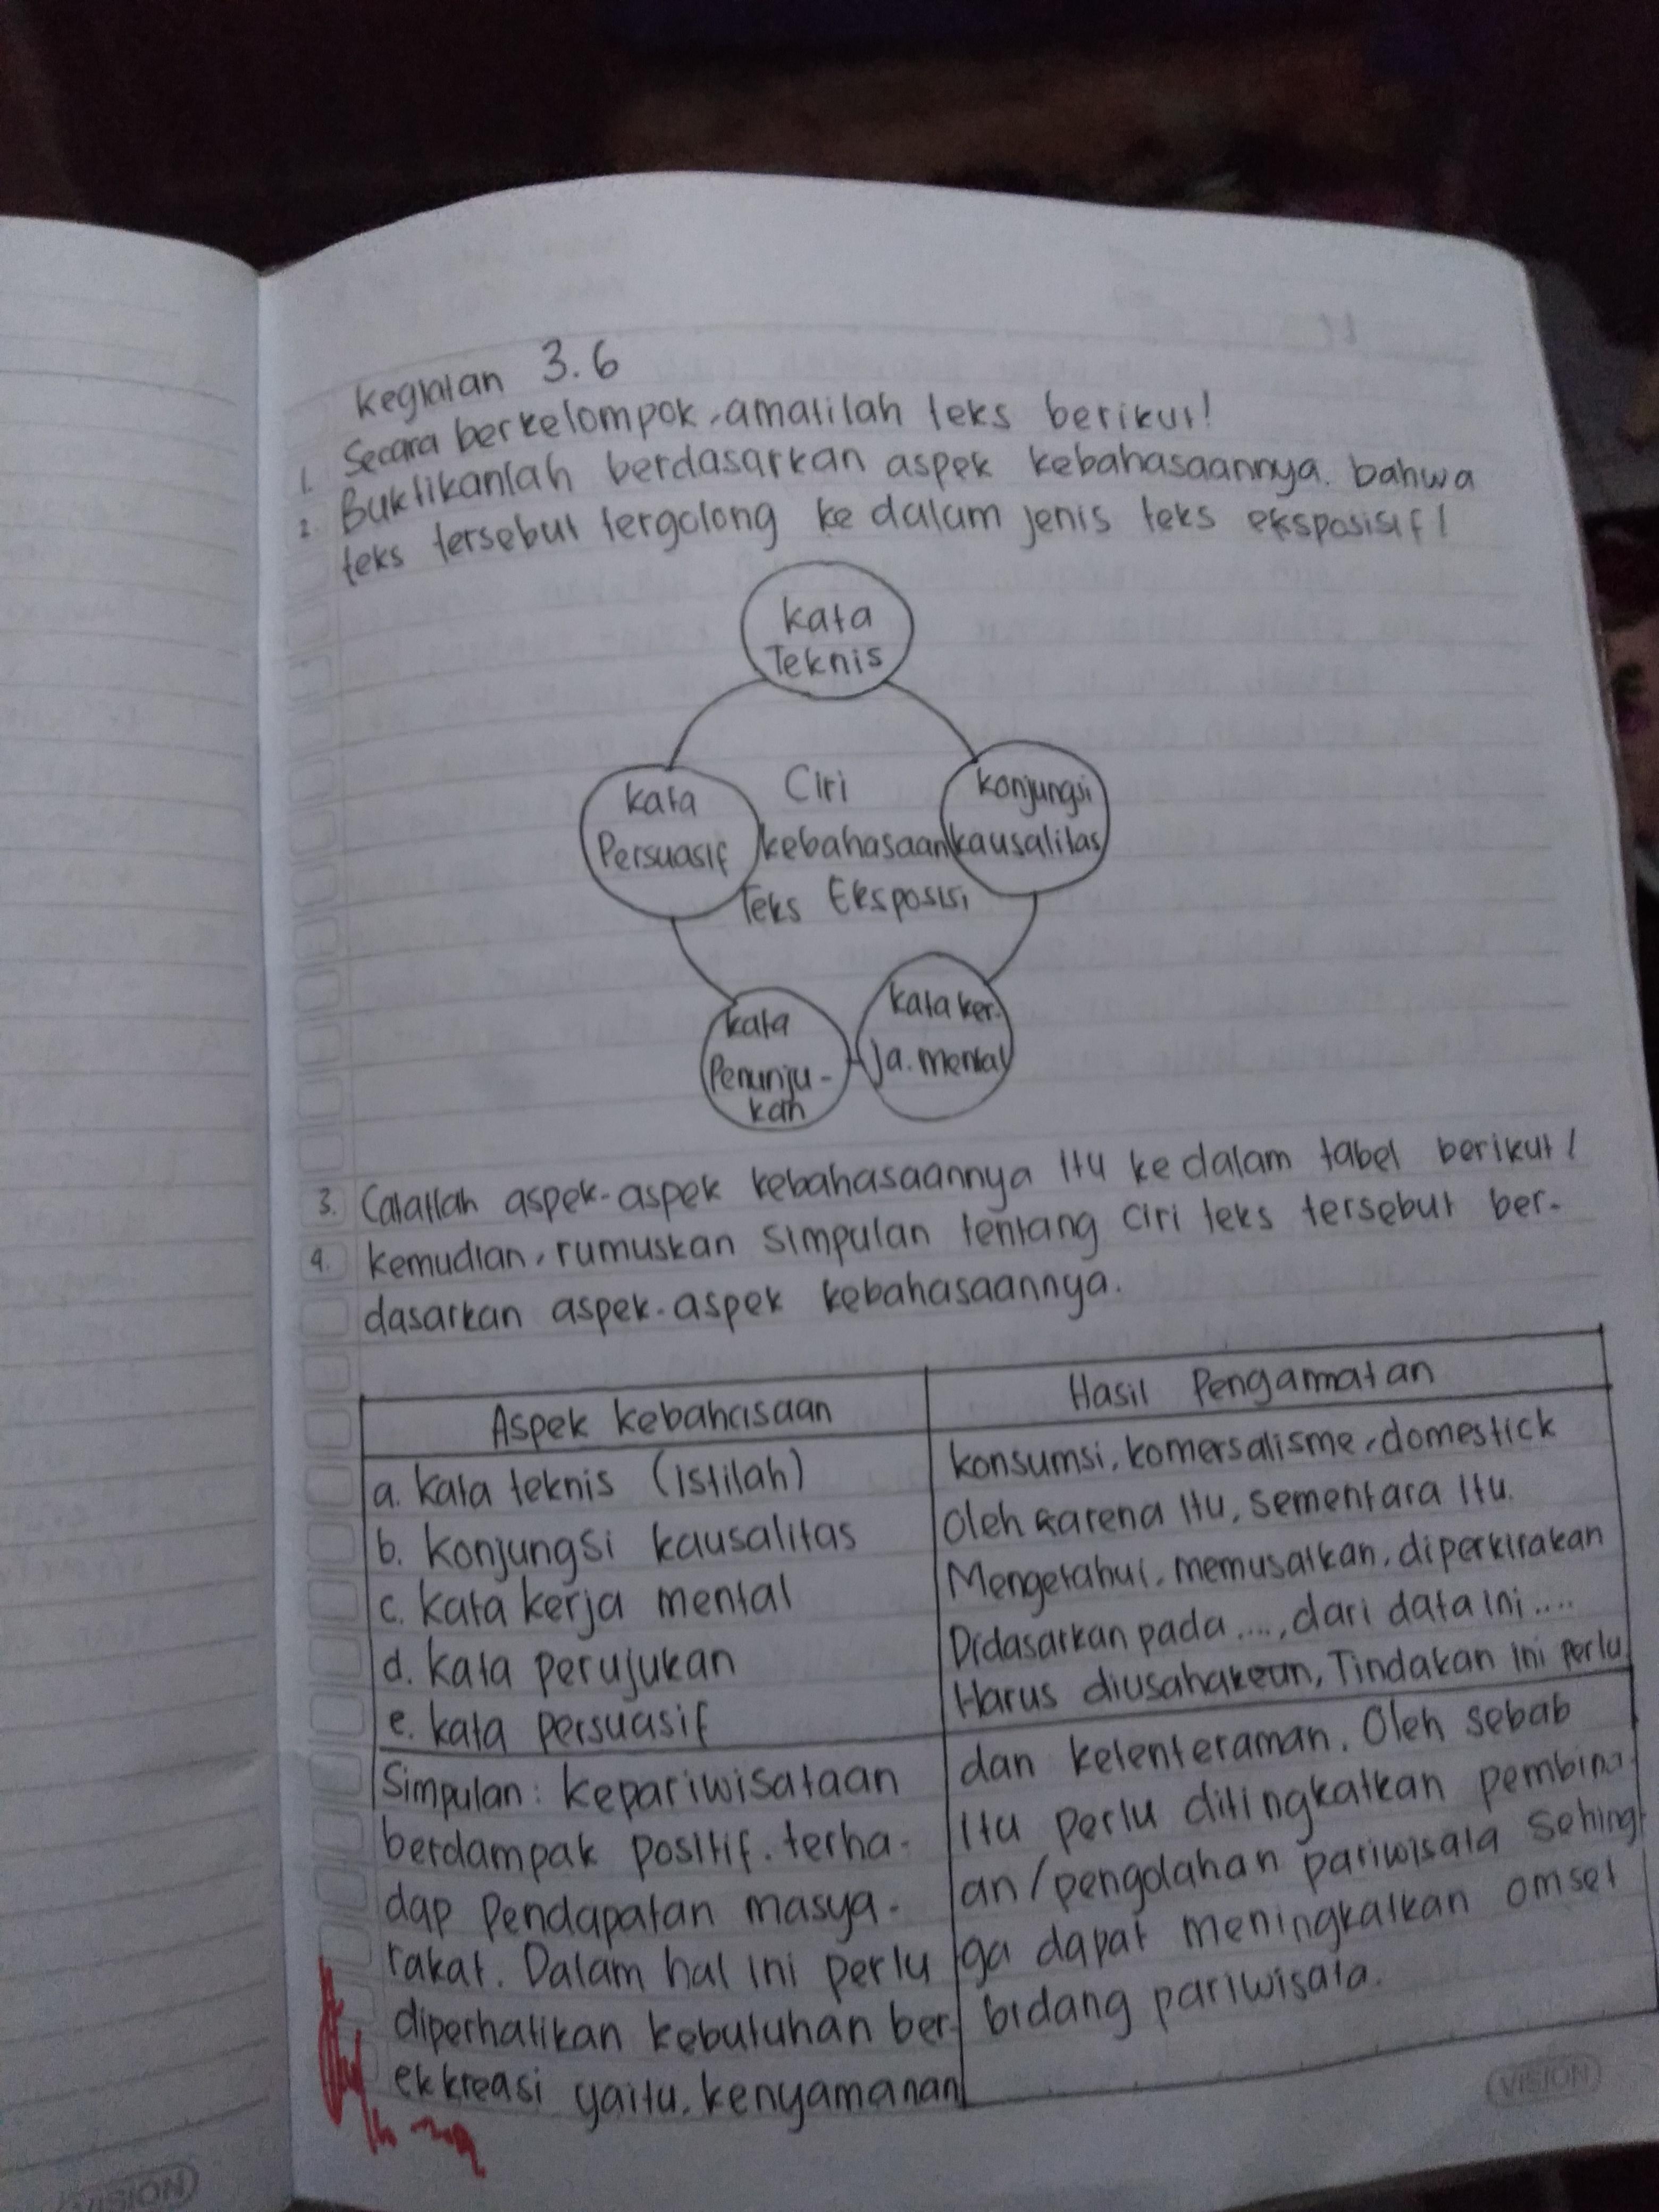 Kunci Jawaban Kirtya Basa Kelas 8 Halaman 29 31 Jawaban Bahasa Jawa Kelas 8 Halaman 29 31 Soal Revisi Cute766 Kunci Jawaban Pai Kelas Xi Ilmu Link